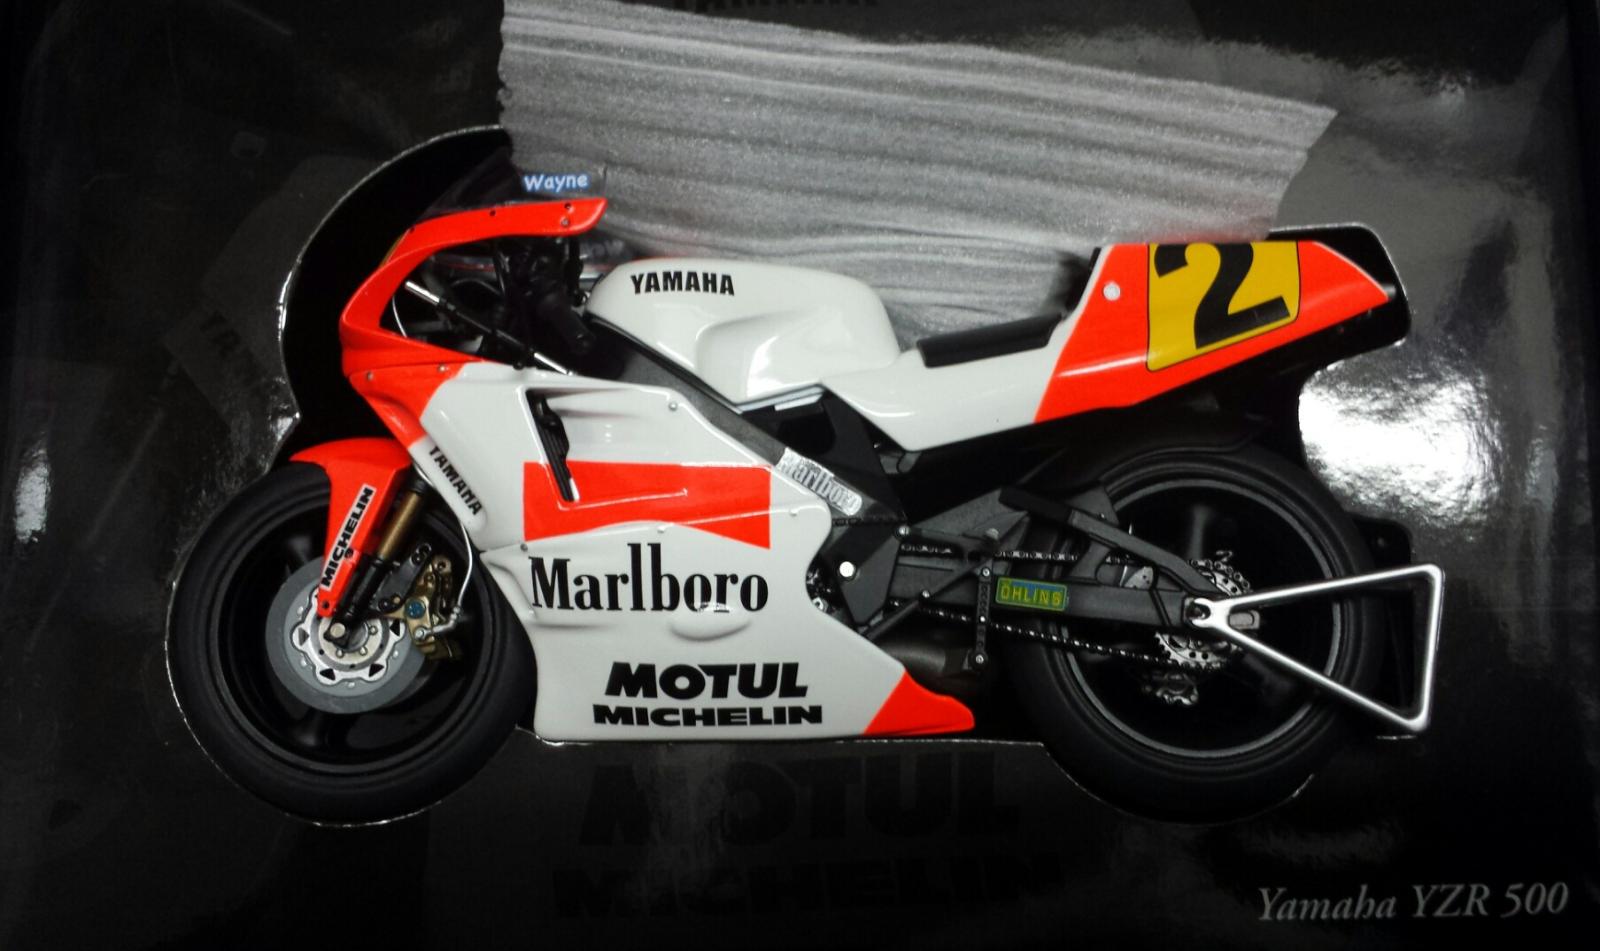 Wayne Rainey - Team Marlboro Roberts - YZR500 - 1990